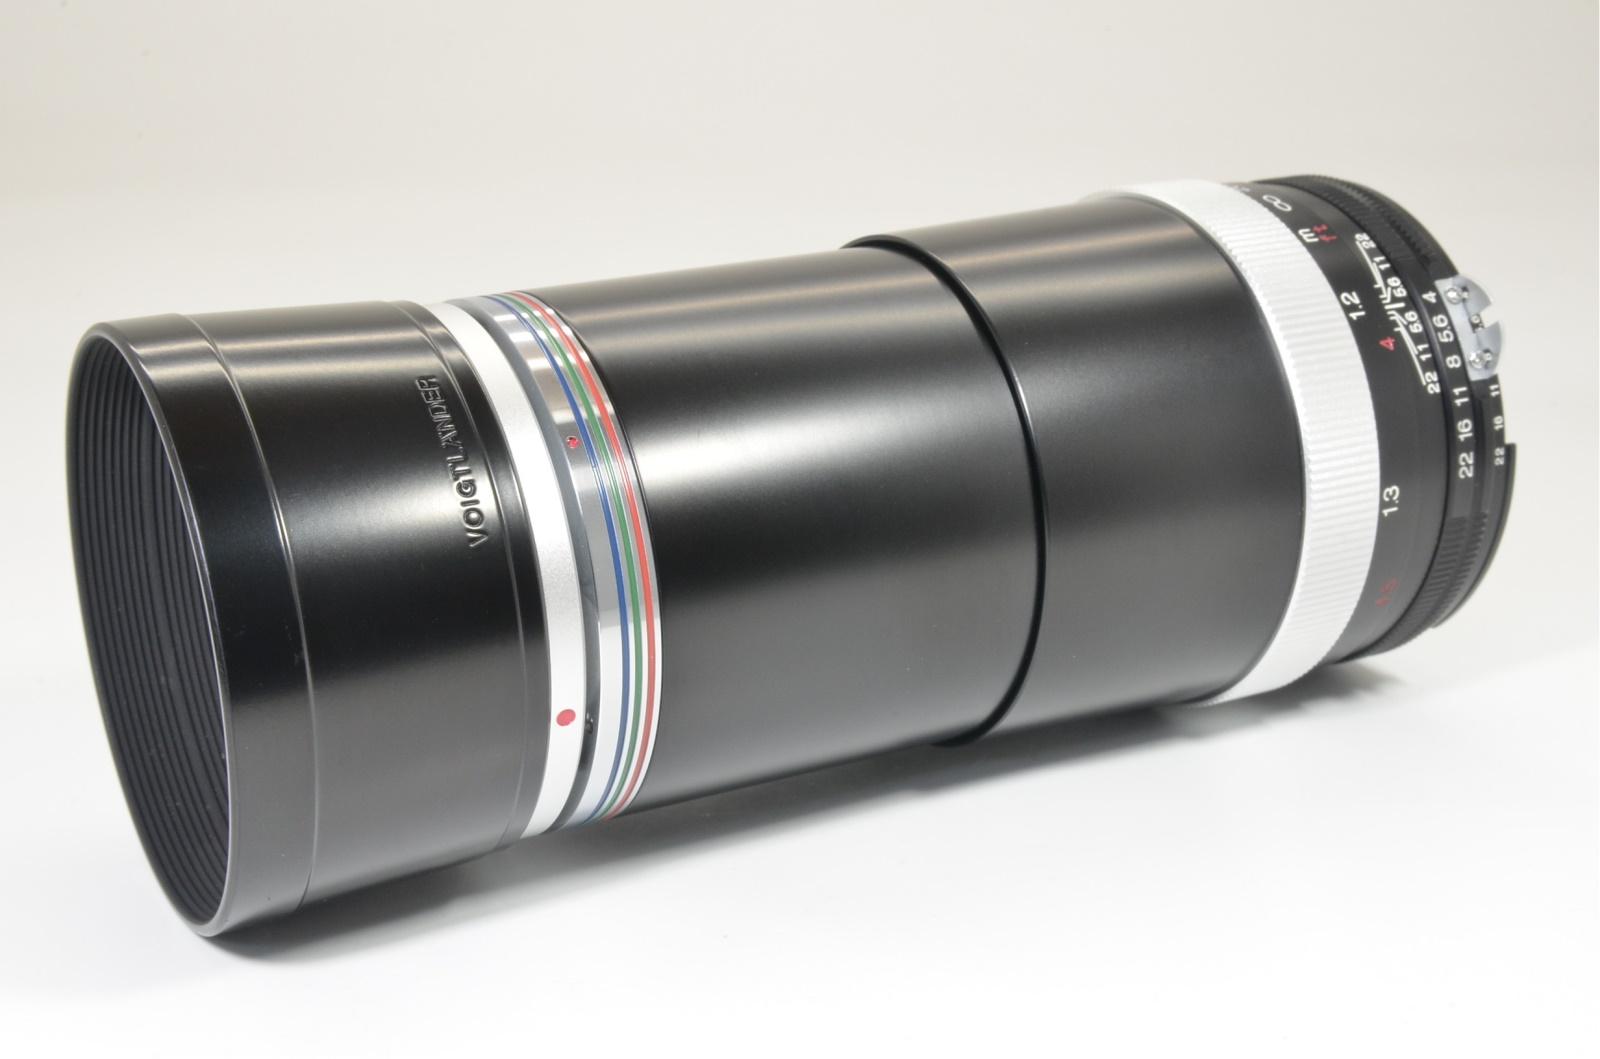 voigtlander apo-lanthar 180mm f4 sl for ai-s nikon recently cla'd by cosina